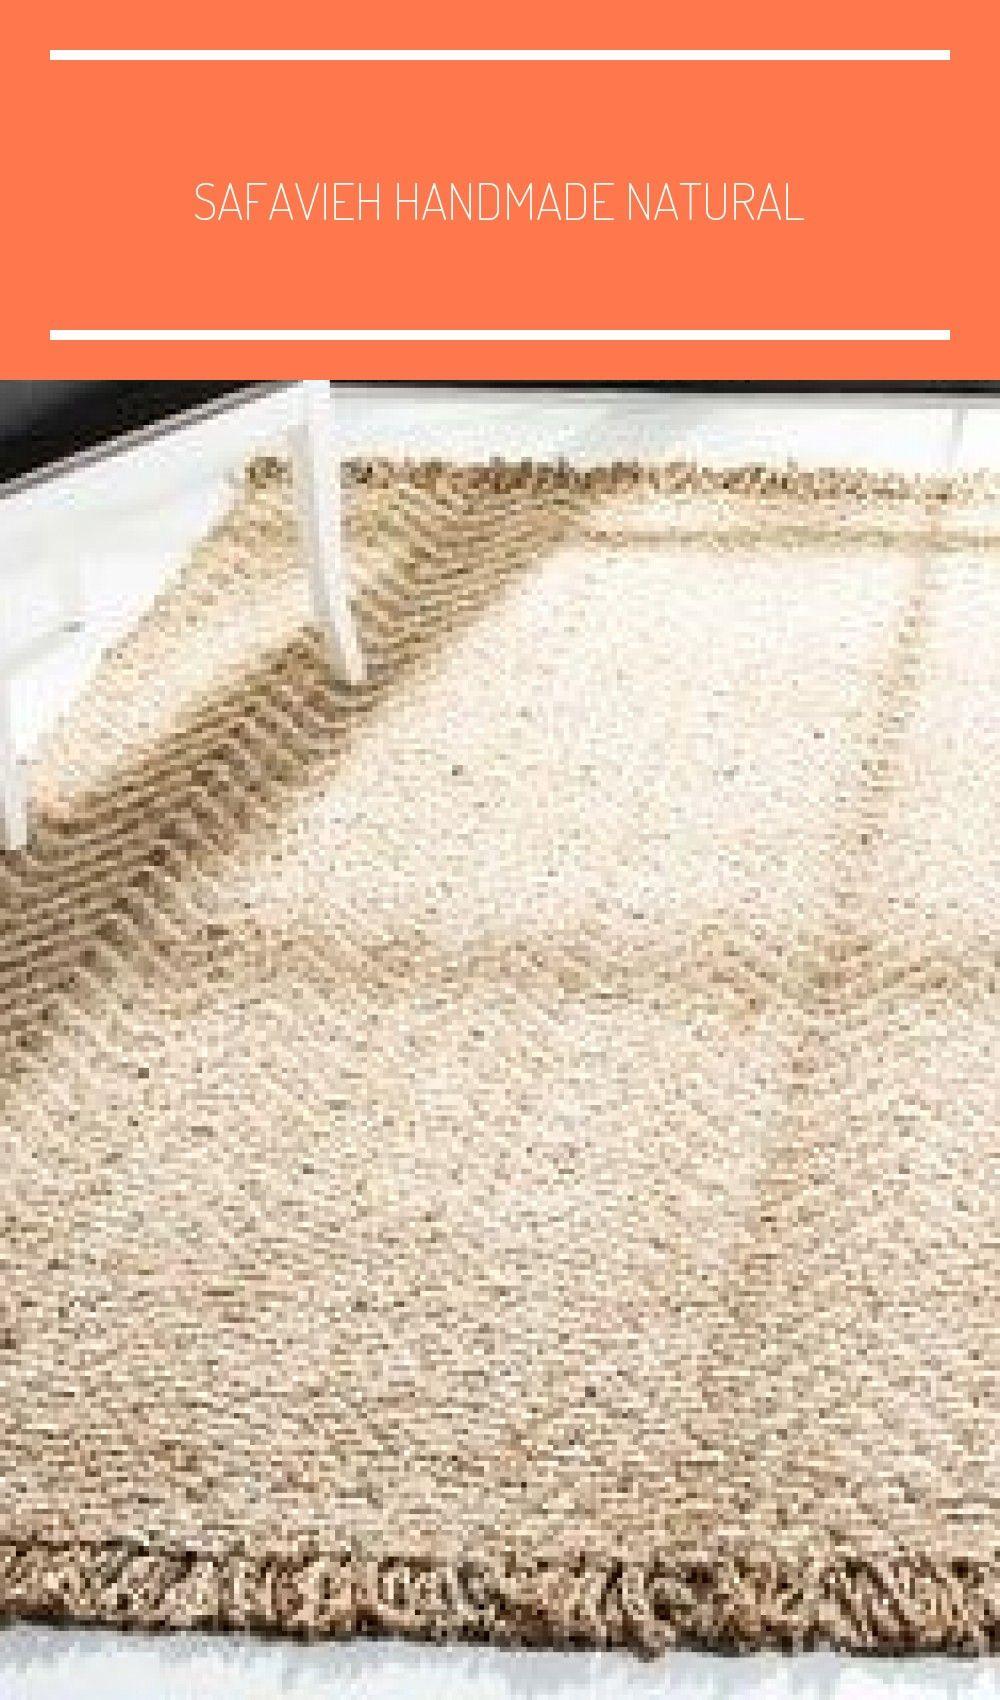 Safavieh Handmade Natural Fiber Luma Casual Chevron Jute Rug With Fringe 10 X 14 Bleach Beige Jute Rug Lay In 2020 Handmade Natural Layered Rugs Rugs On Carpet